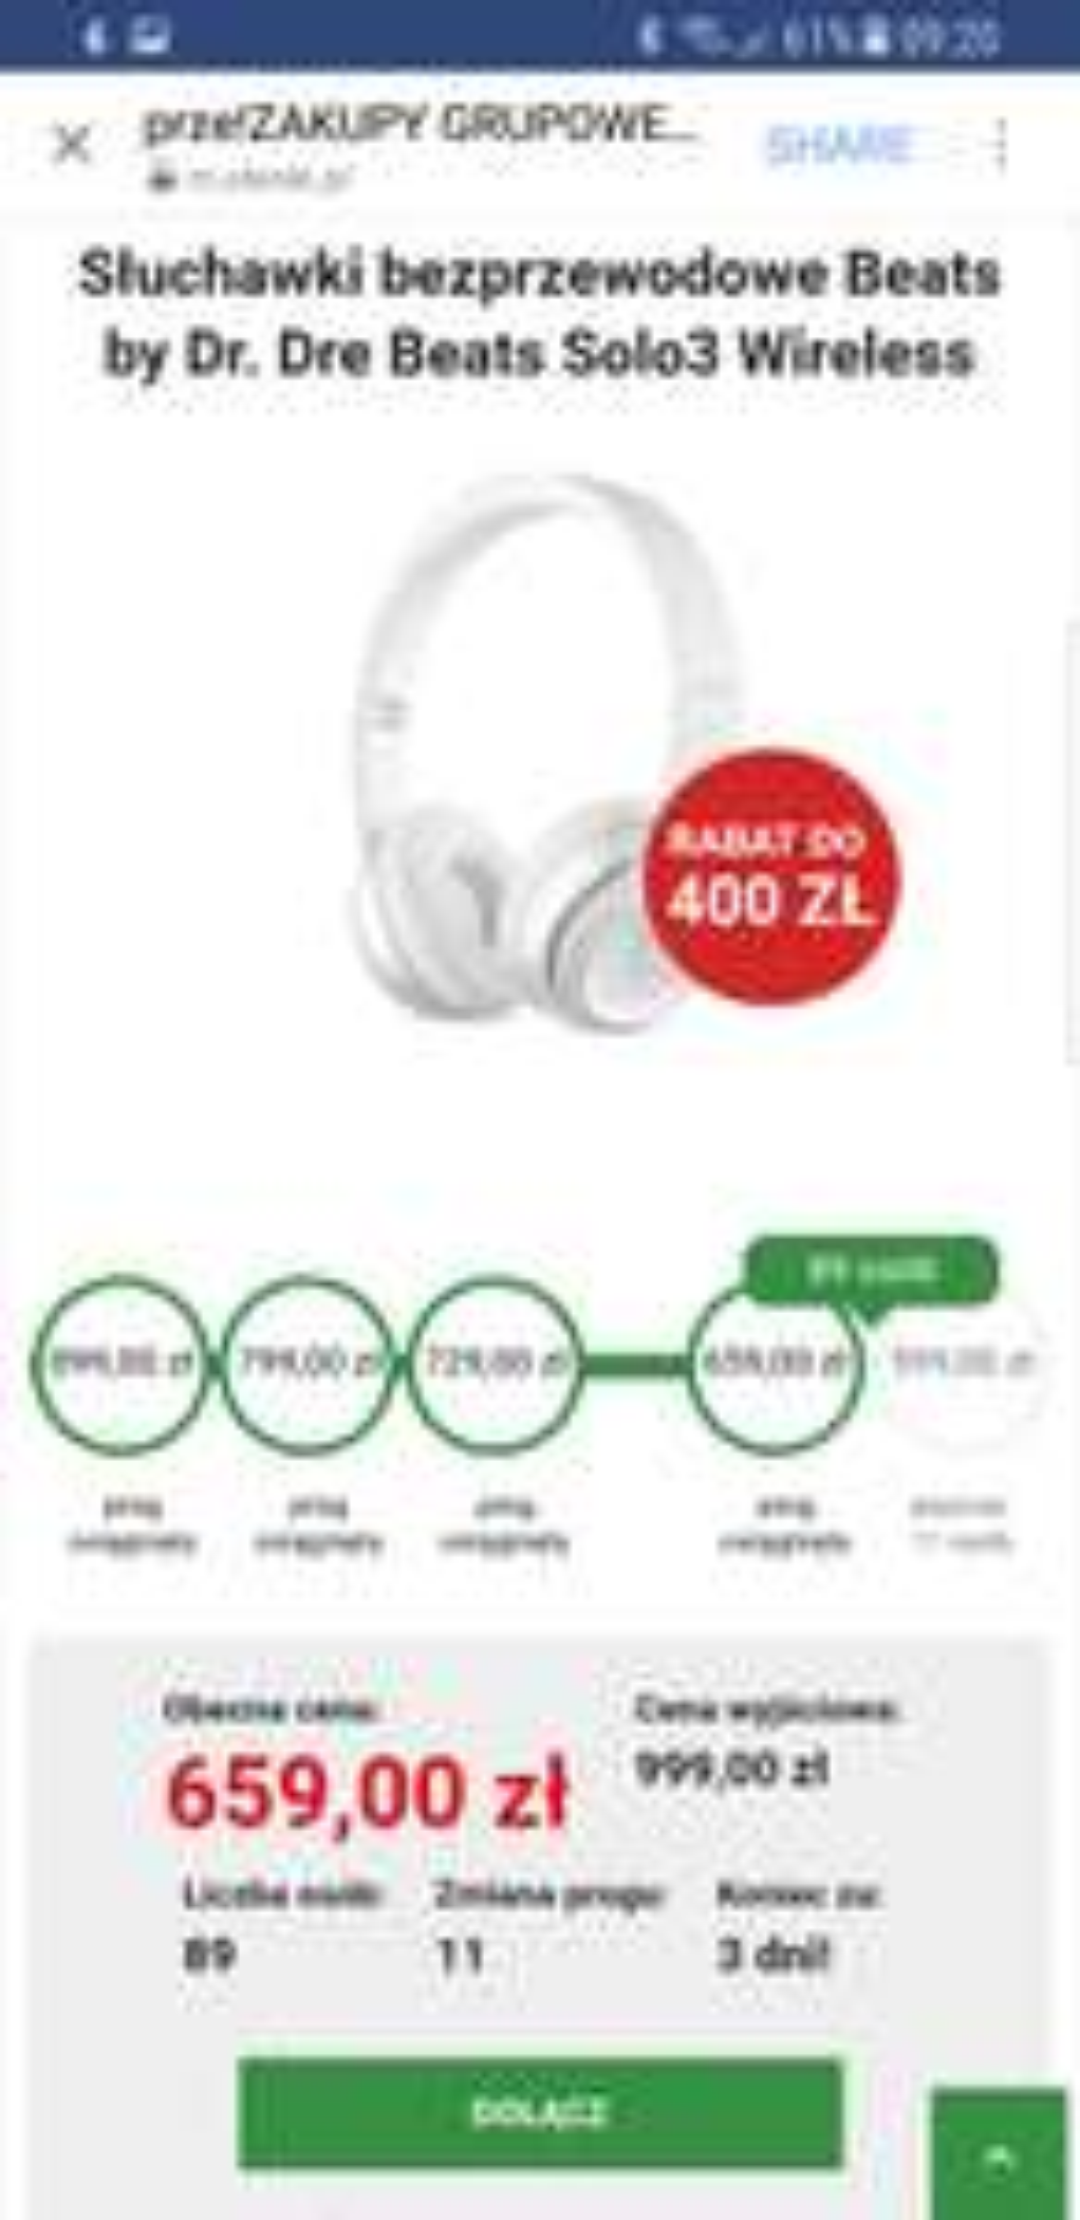 Słuchawki bezprzewodowe Beats by Dr. Dre Beats Solo3 Wireless